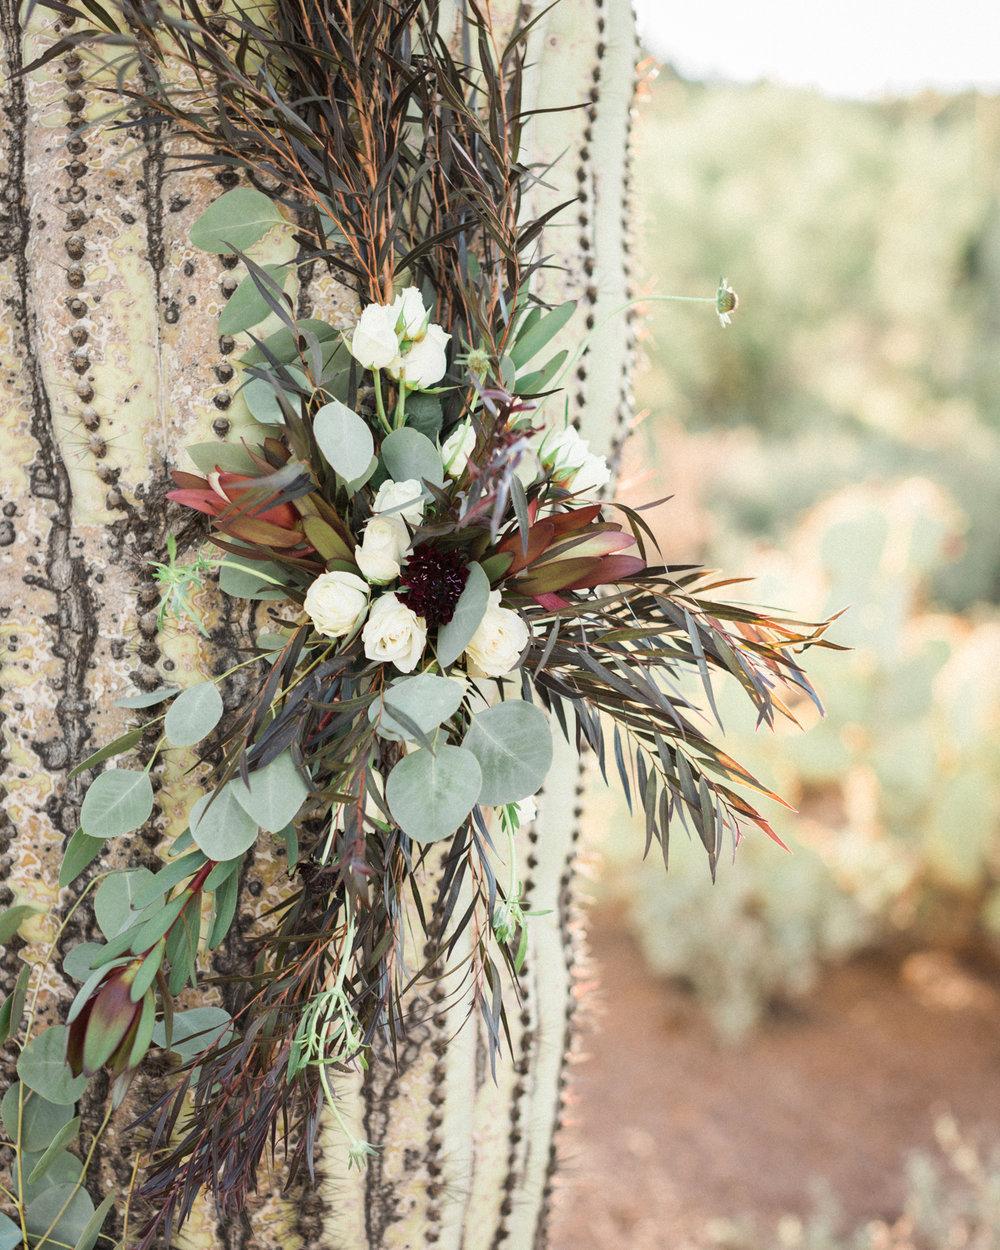 Saguaro cactus floral installation